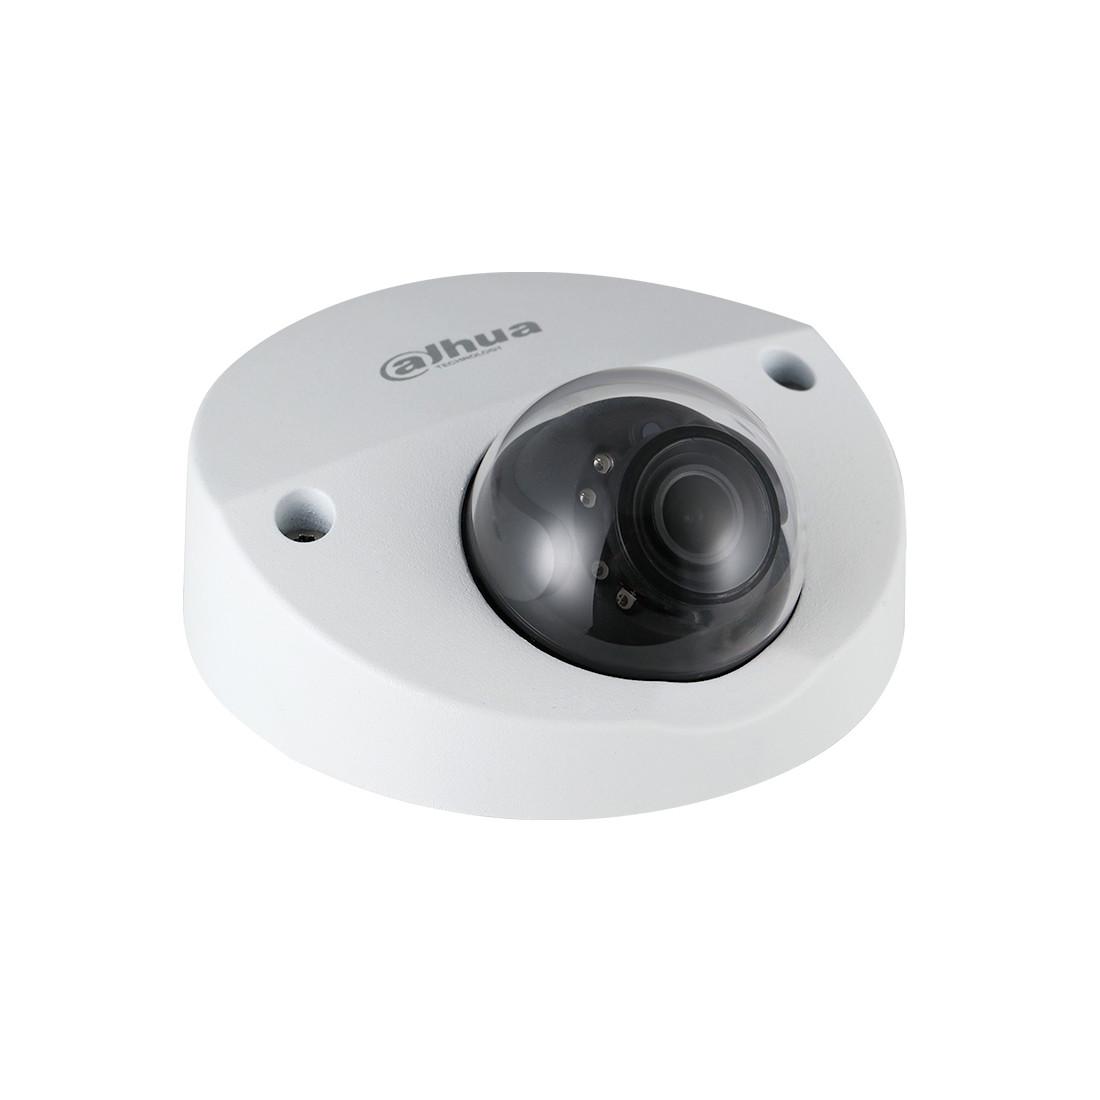 Купольная видеокамера Dahua DH-IPC-HDBW2231FP-AS-0280B